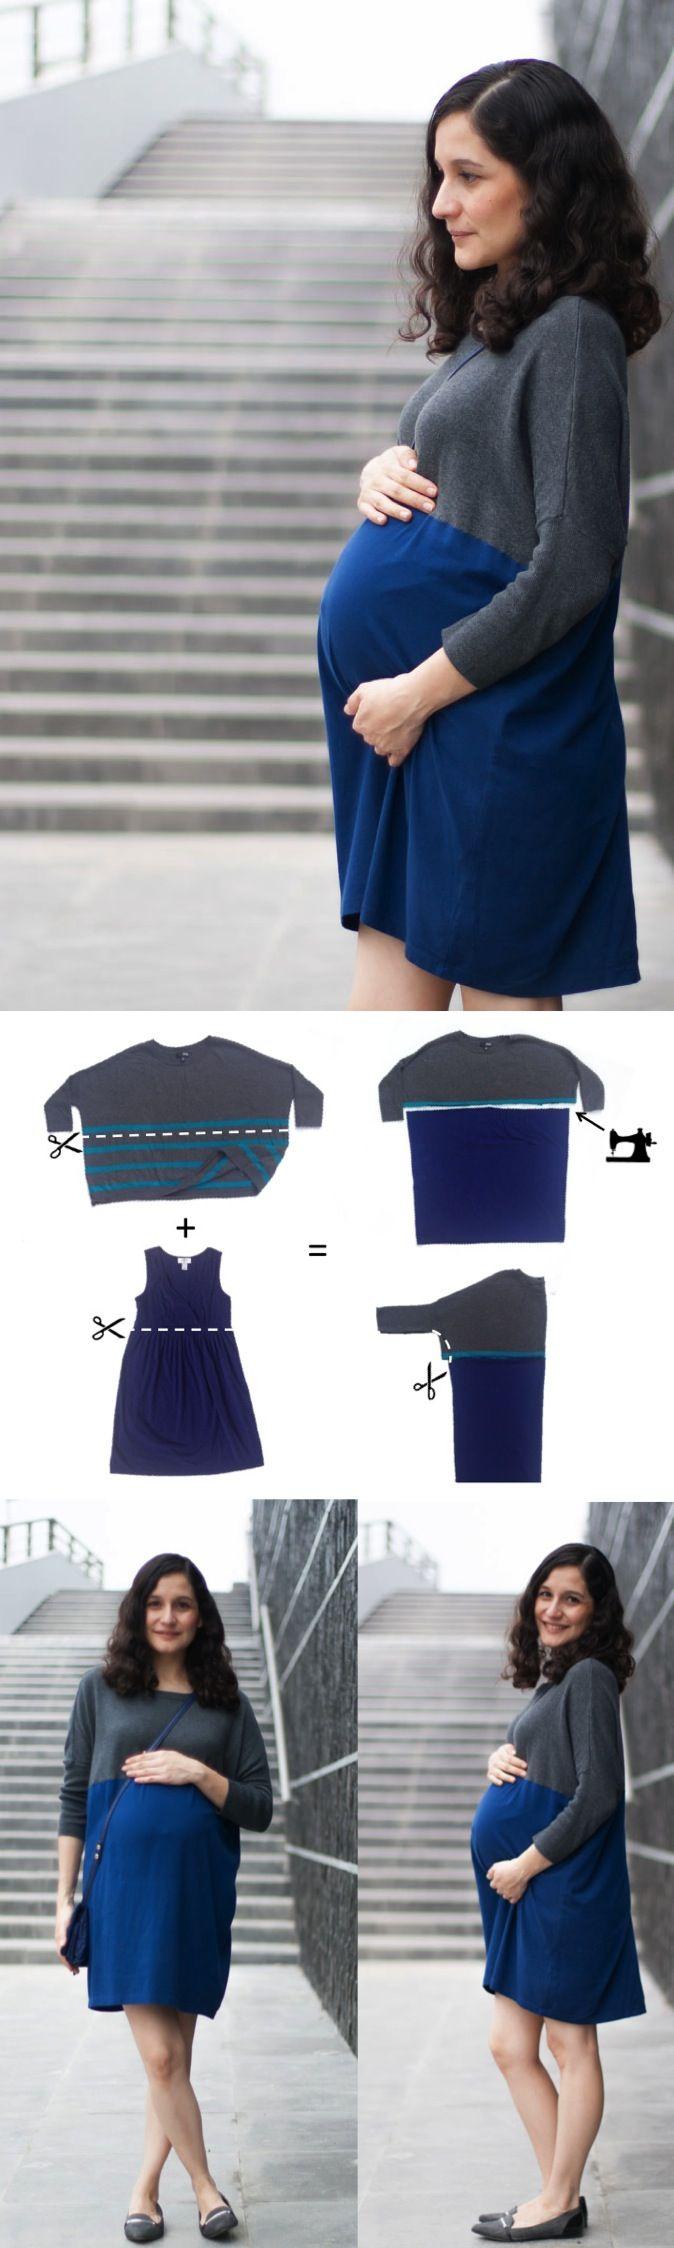 DIY Maternity Dress (refashion tutorial)